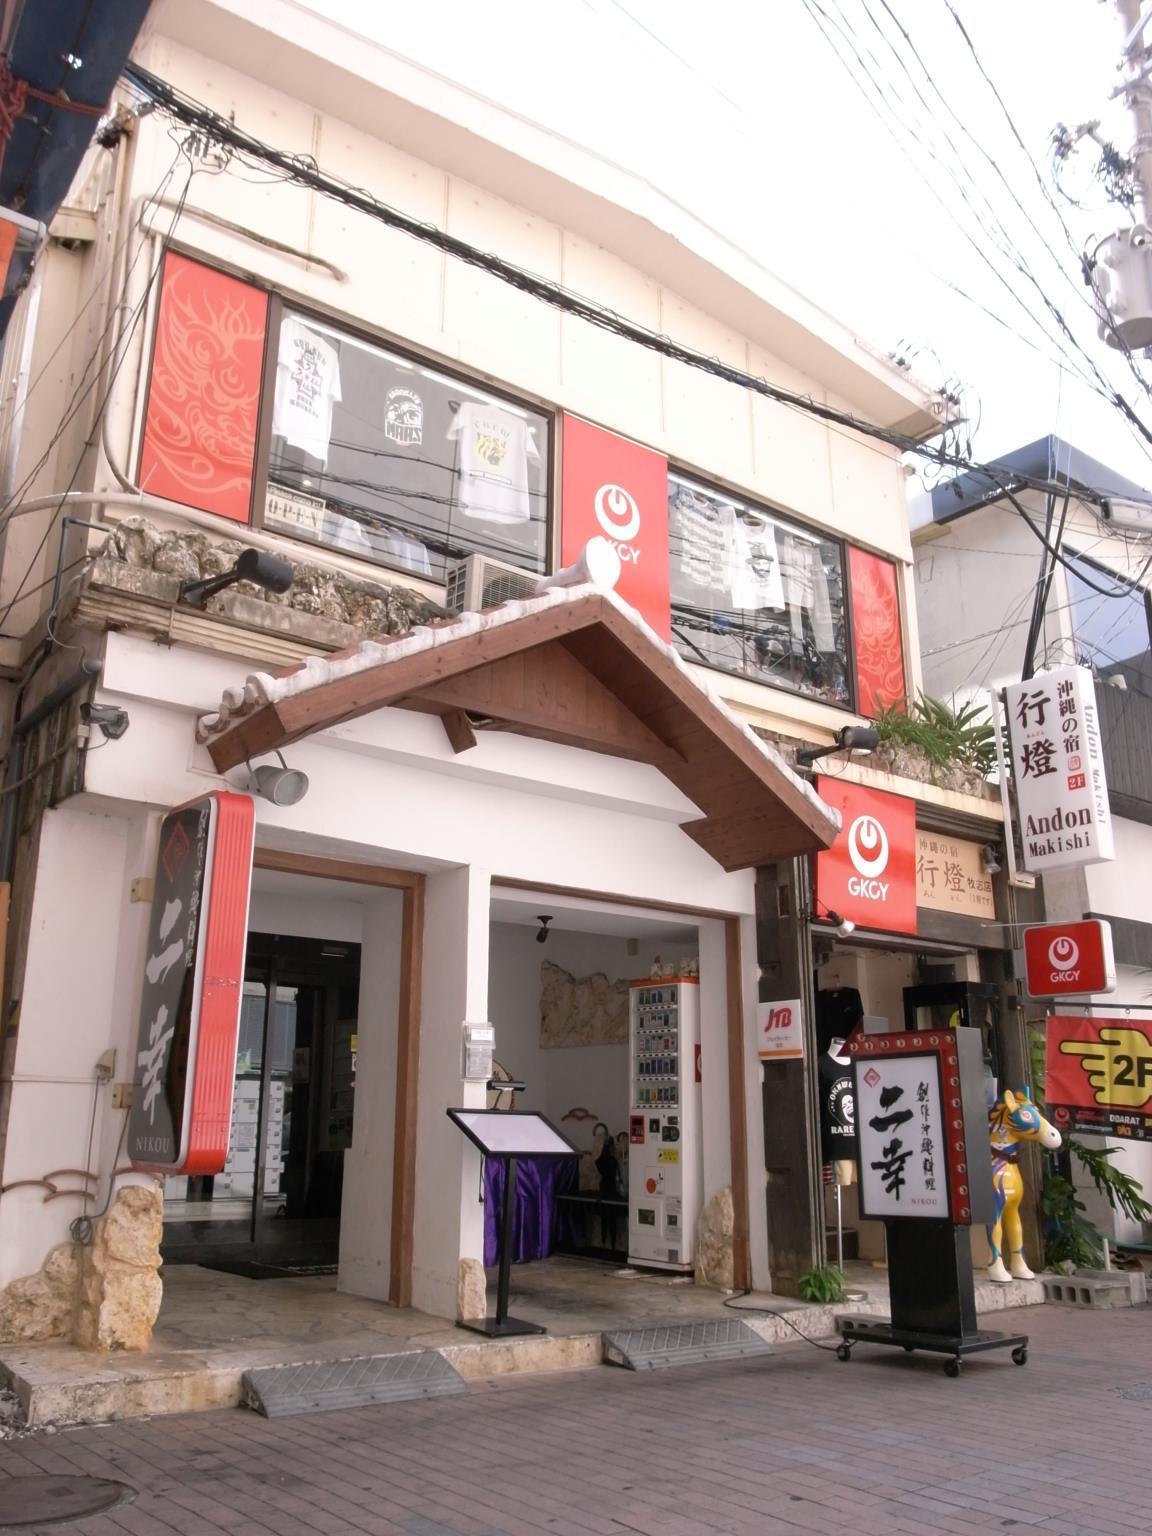 Okinawa No Yado Andon Makishikan